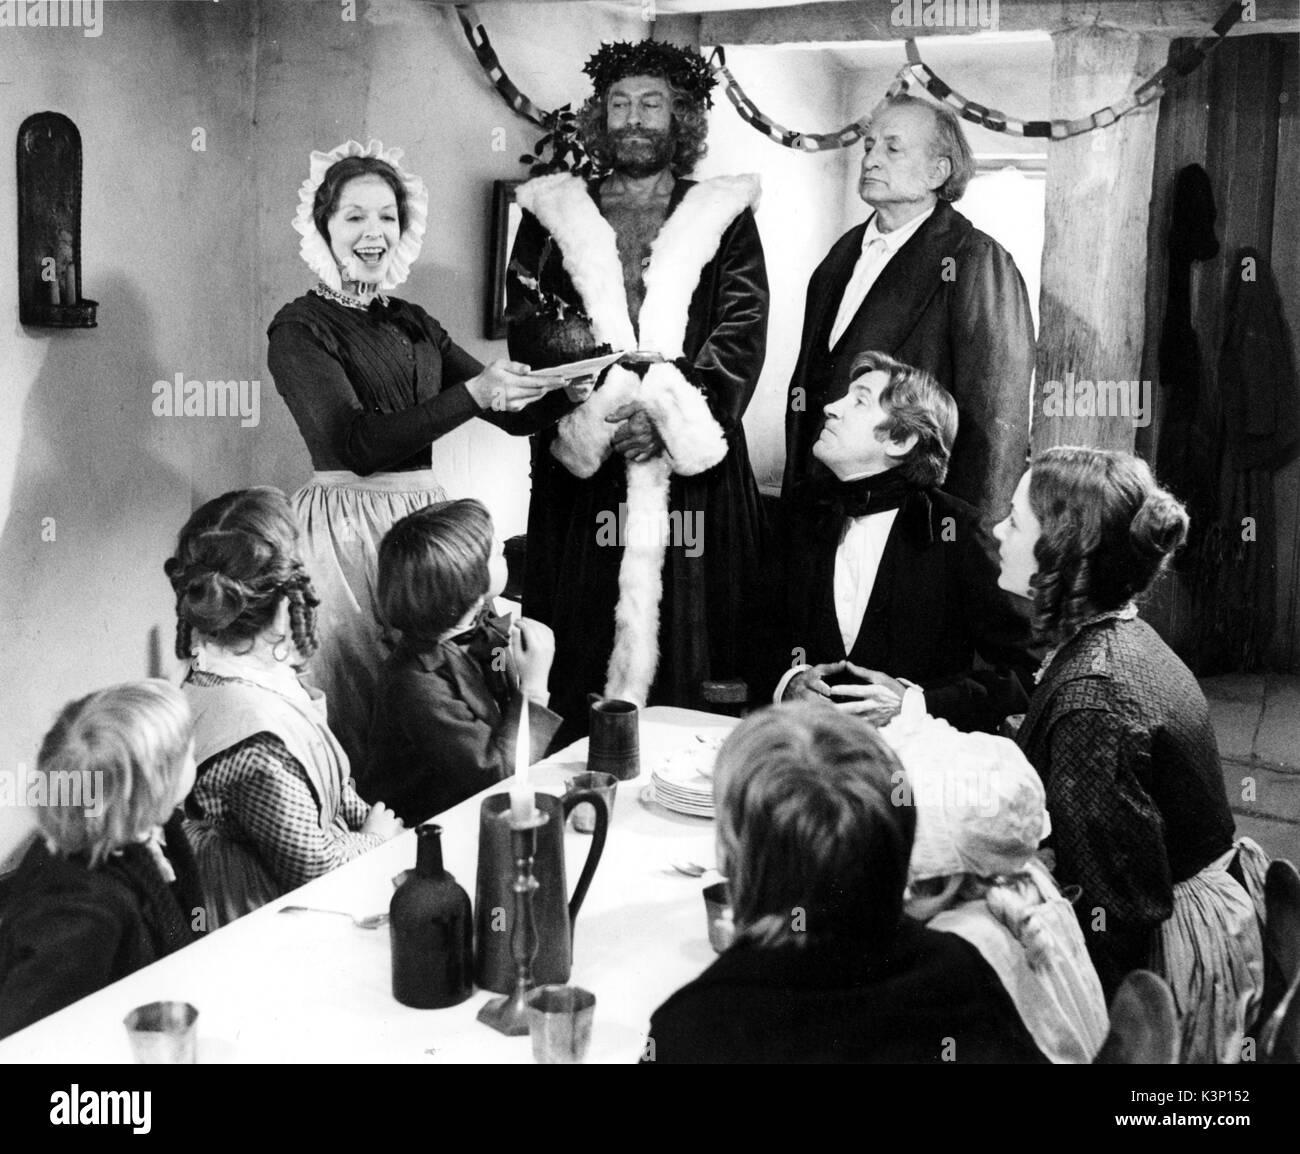 Ebenezer Scrooge Muppet Christmas Carol Jpg: A Christmas Carol Film Stock Photos & A Christmas Carol